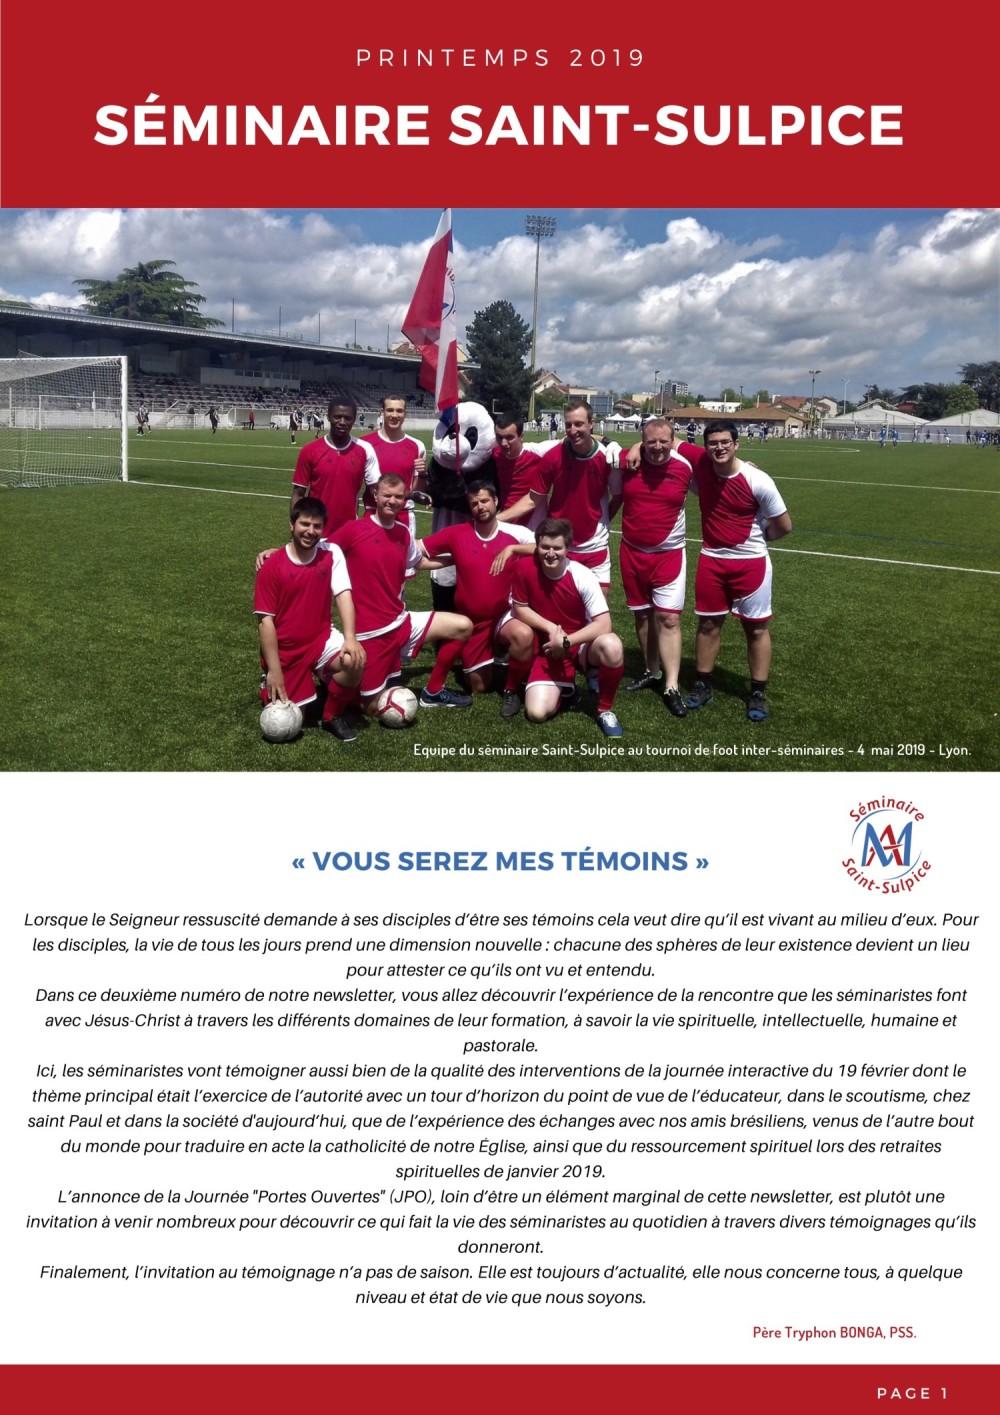 Newsletter Séminaire Saint-Sulpice mai 2019 - p1